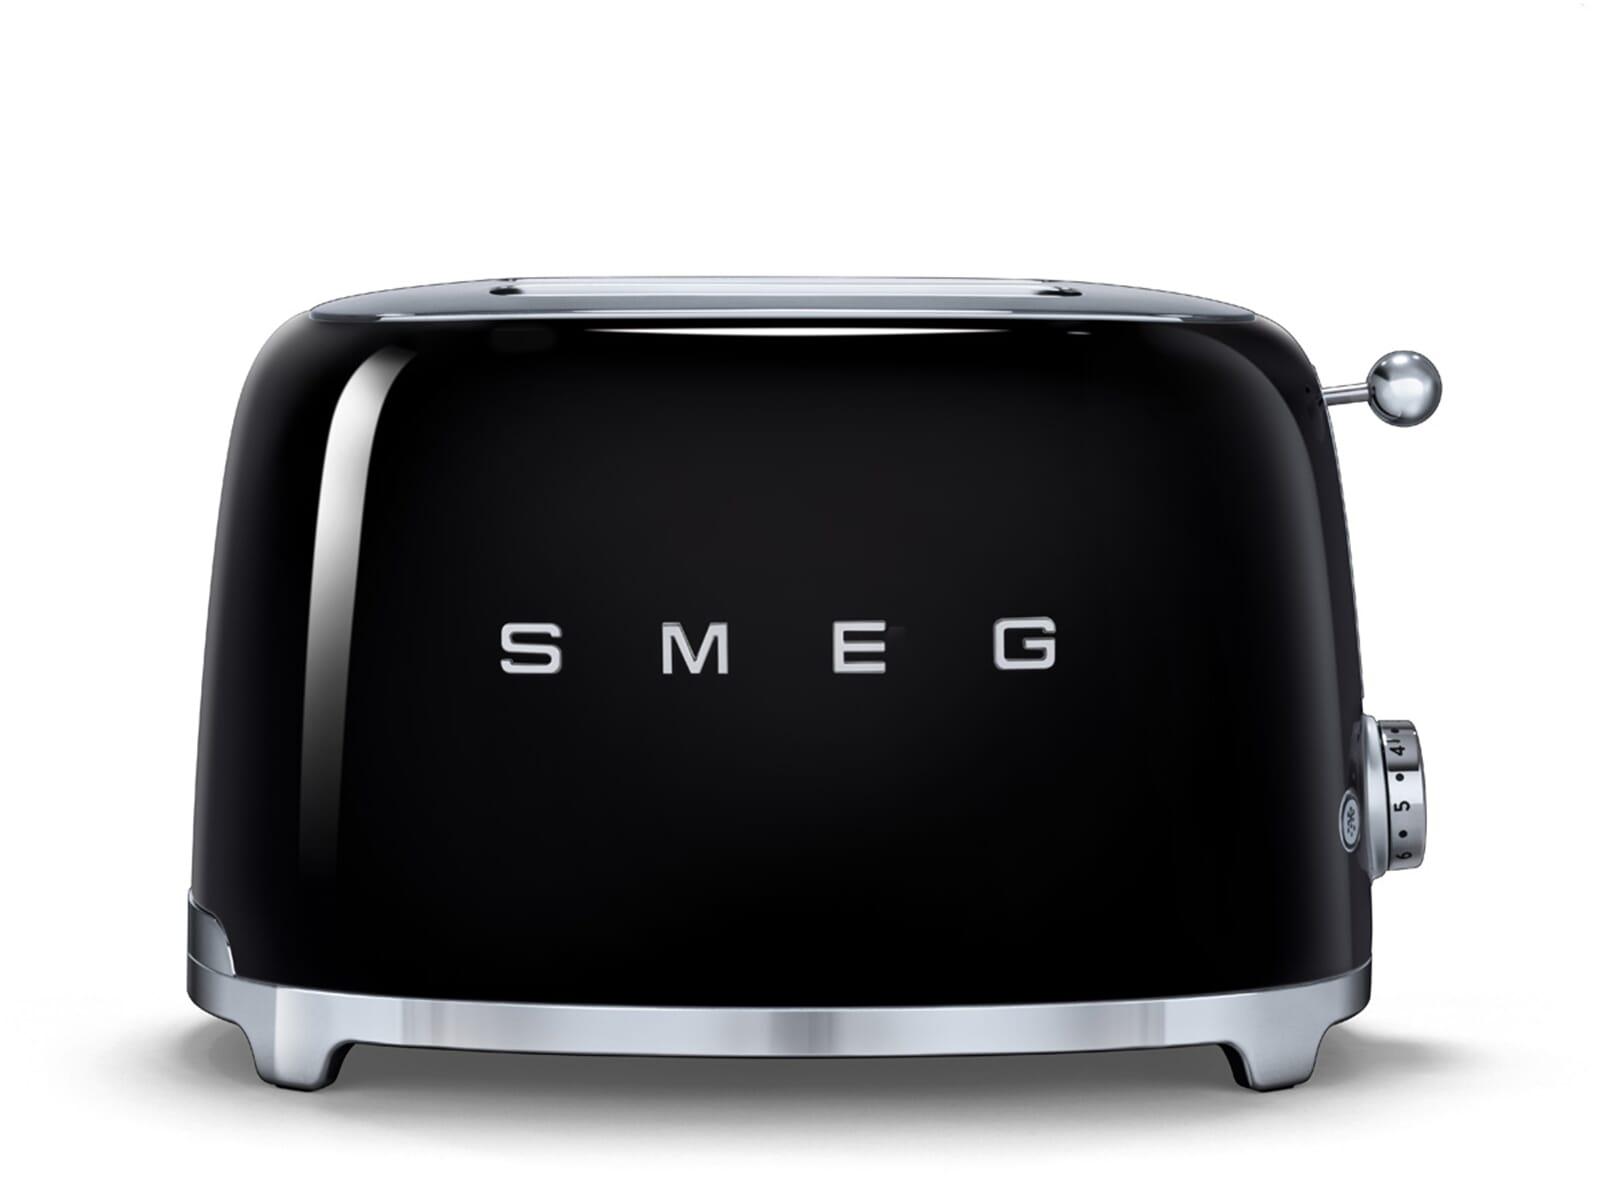 Smeg tsf01bleu 2 scheiben toaster schwarz fur 13900 eur for Smeg schwarz